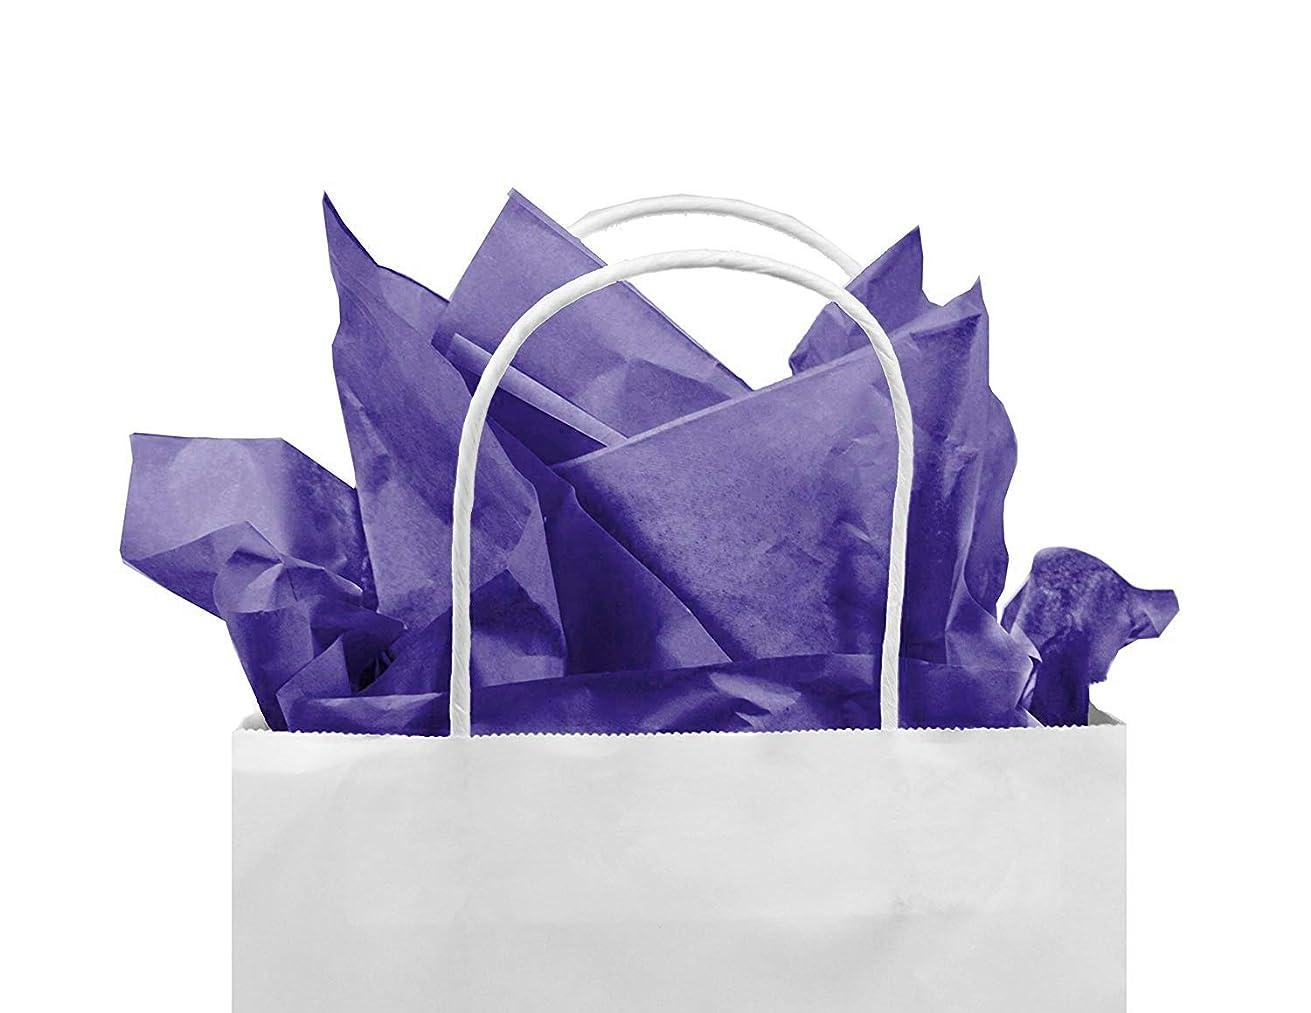 Gift Tissue Paper Bulk - 60-Sheet Purple Gift Wrapping Tissue Paper, 20 x 20 Inches, Gift Bag Tissue Paper Gift Wrap, Premium Quality Tissue Paper, Paper Craft Supplies (Purple, 60 CT)